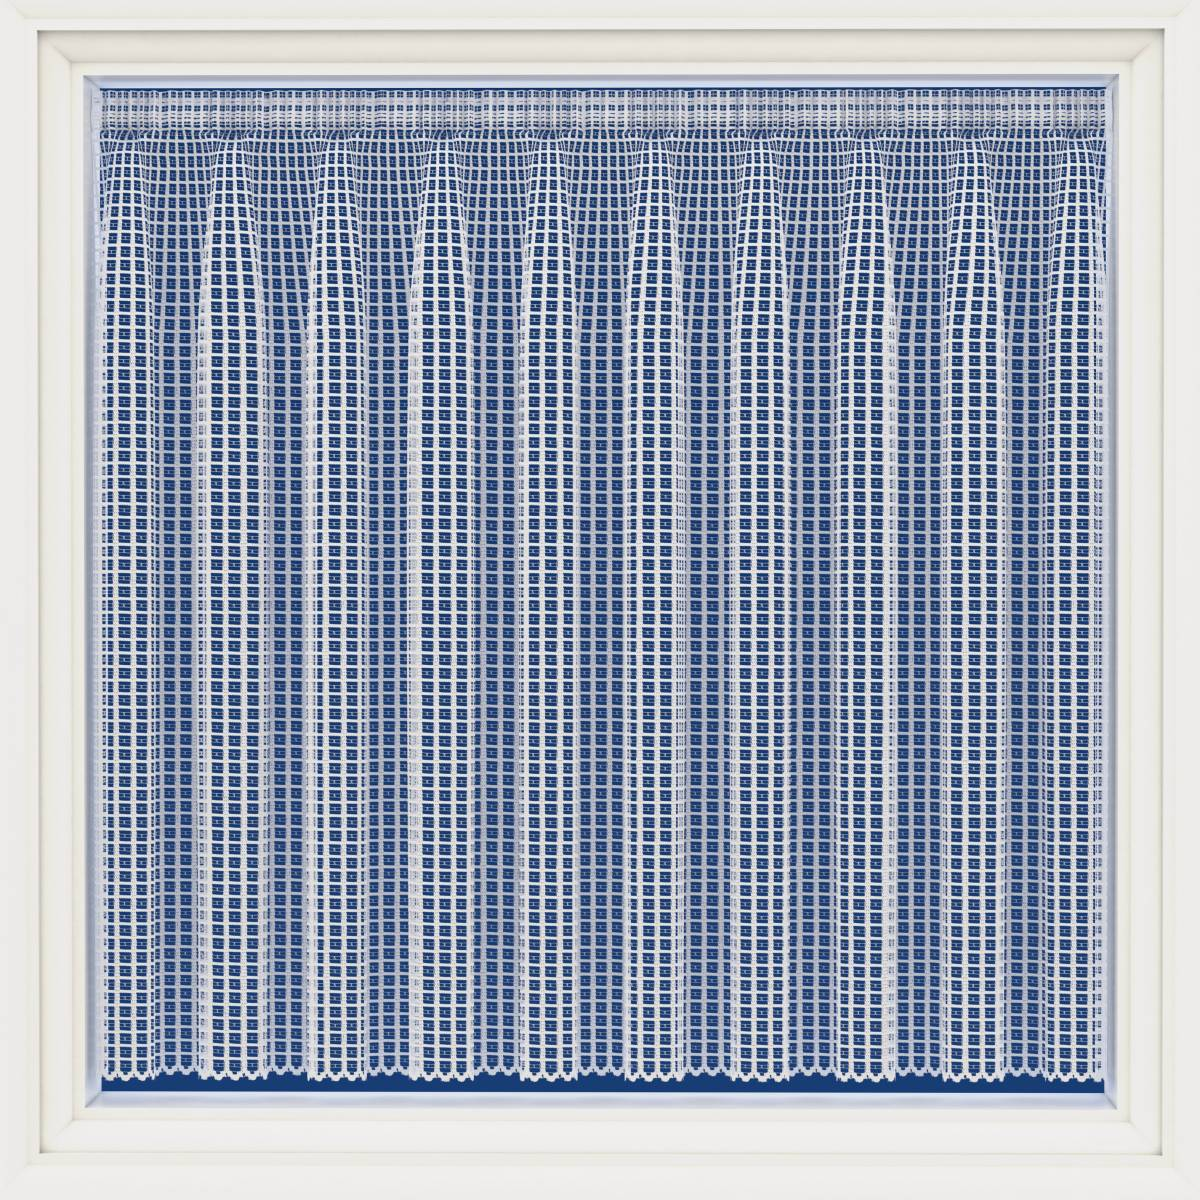 london white contemporary net curtain net curtain 2. Black Bedroom Furniture Sets. Home Design Ideas